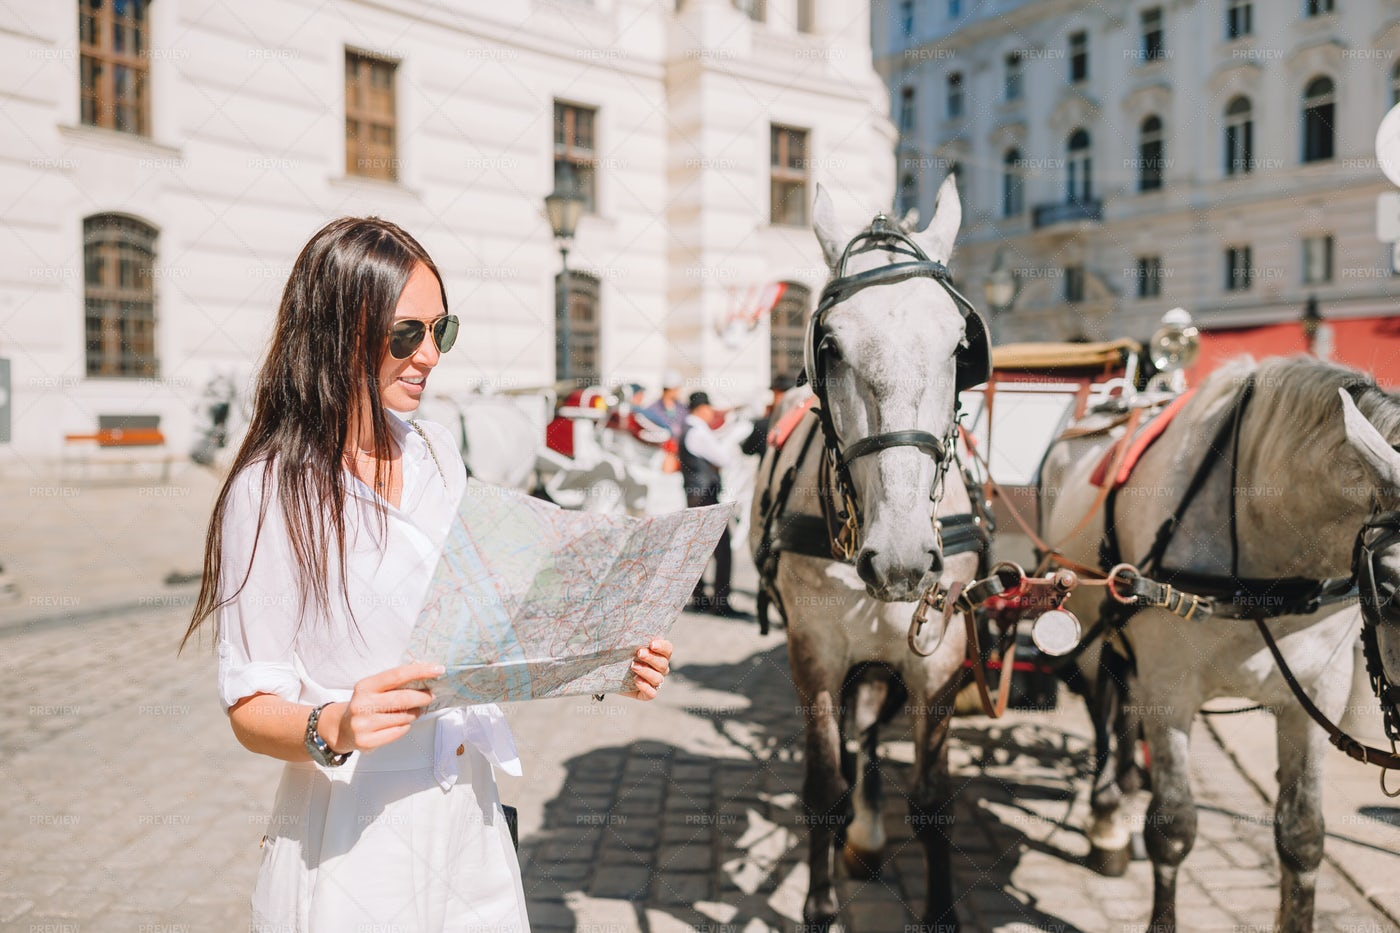 Tourist Looks At Map Of Vienna: Stock Photos